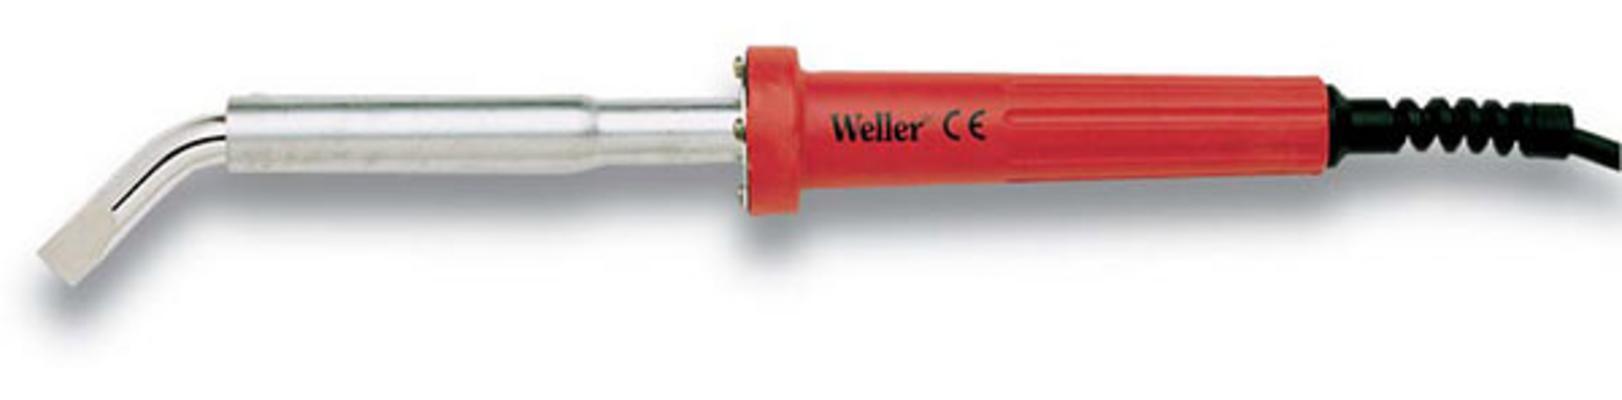 Juotoskolvi 120 W, Weller - Juotoskolvi 120 W, kärki 12,5 mm